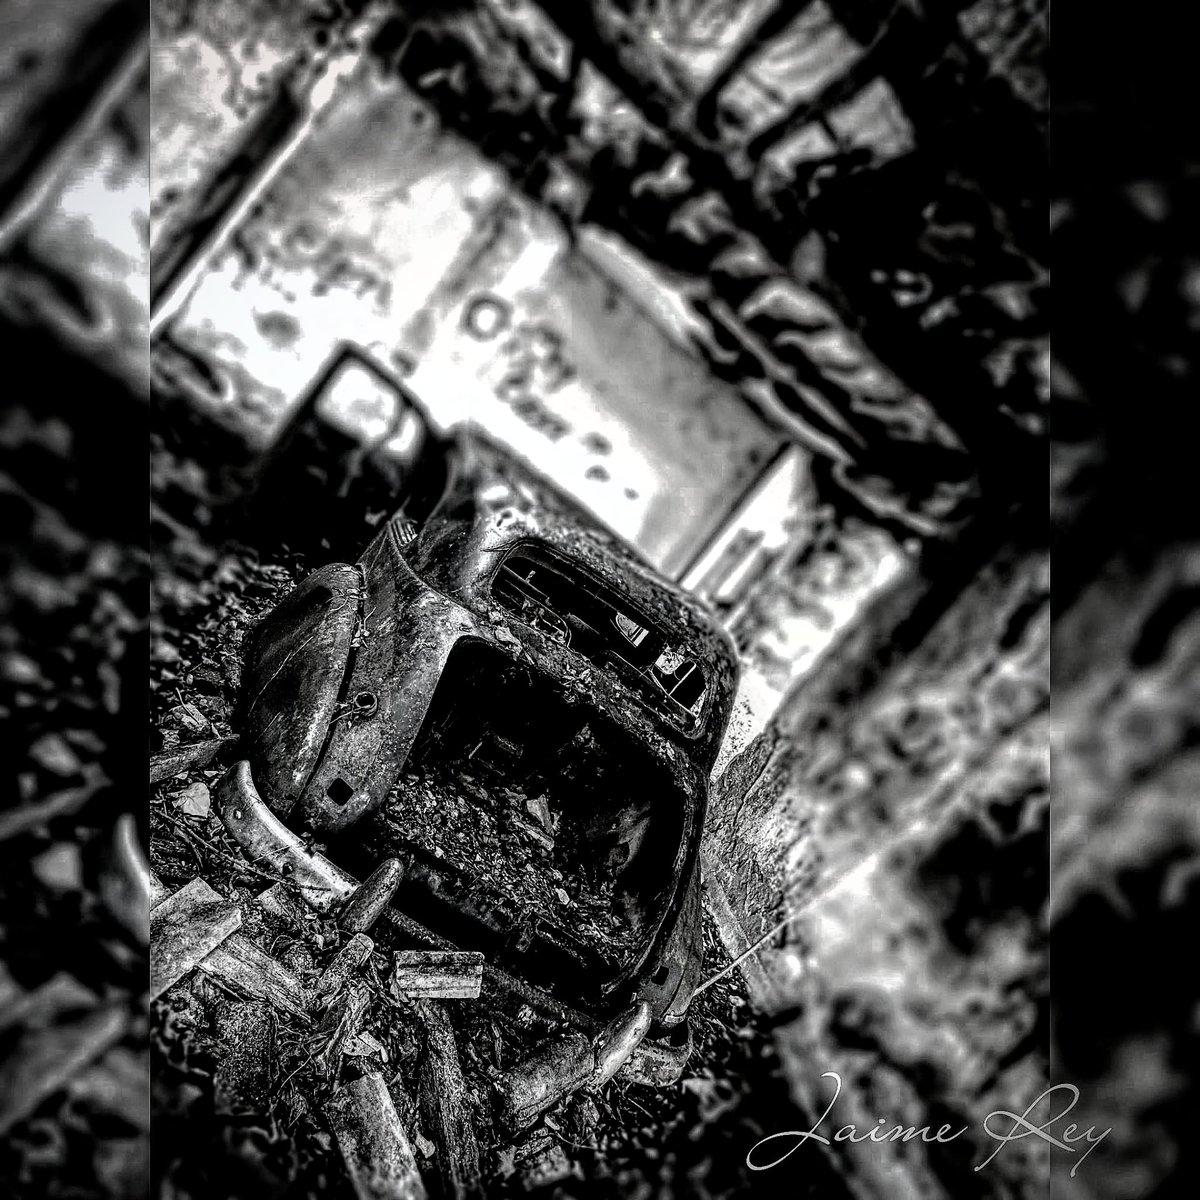 Coche abandonado (Serie Urbex)  #urbexspain #urbexworld #urbexphotography #photooftheday #oppocrew #shotonoppo #fotografia #fotosconelmovil #coche #ruinas #GalizaMáxica #urbexgalicia #blackandwhite #blackandwhitephotography #blancoynegro @galiciamaxica @Turgalicia @oppomobilees